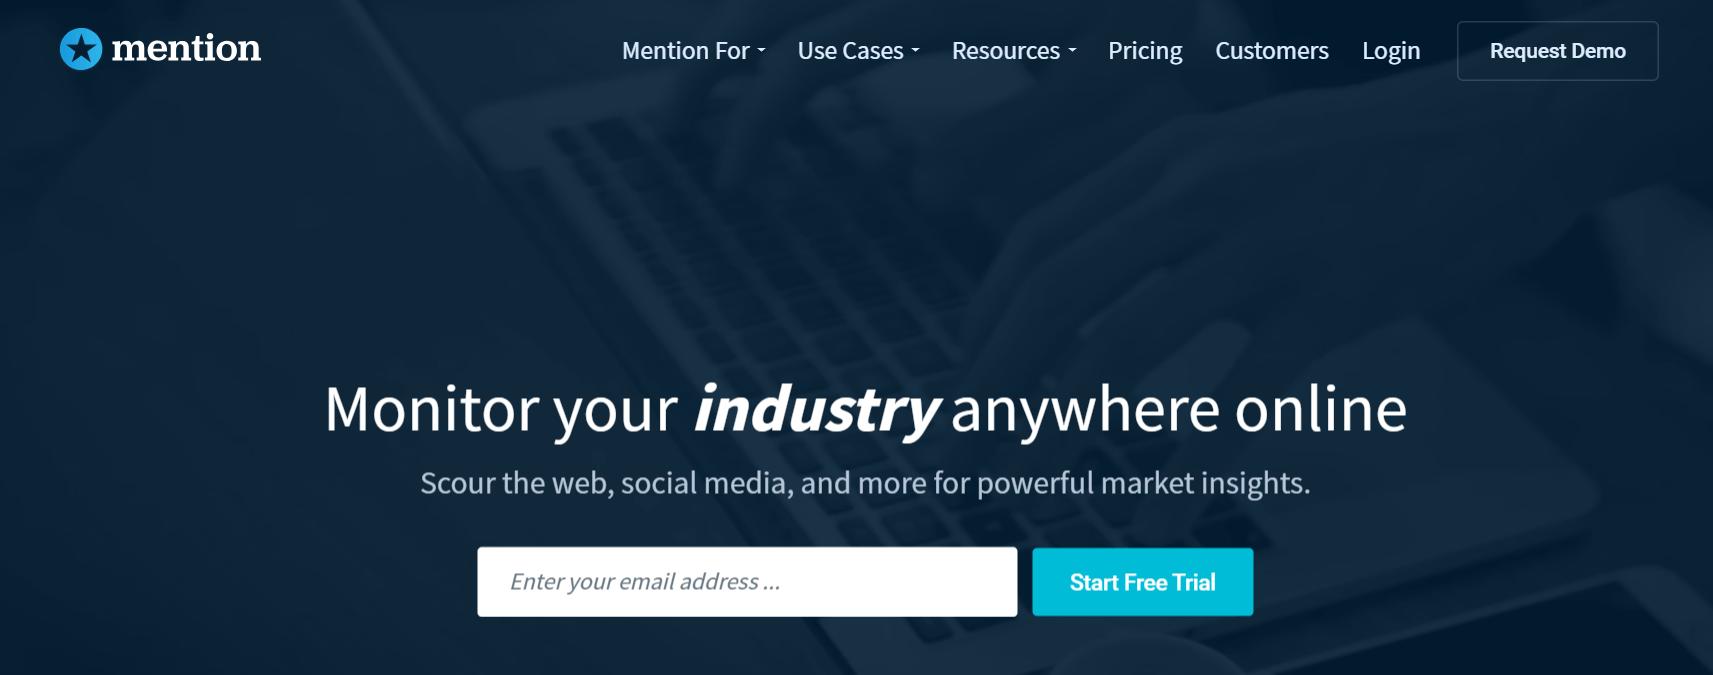 Social Listening Tools: The Mention website.